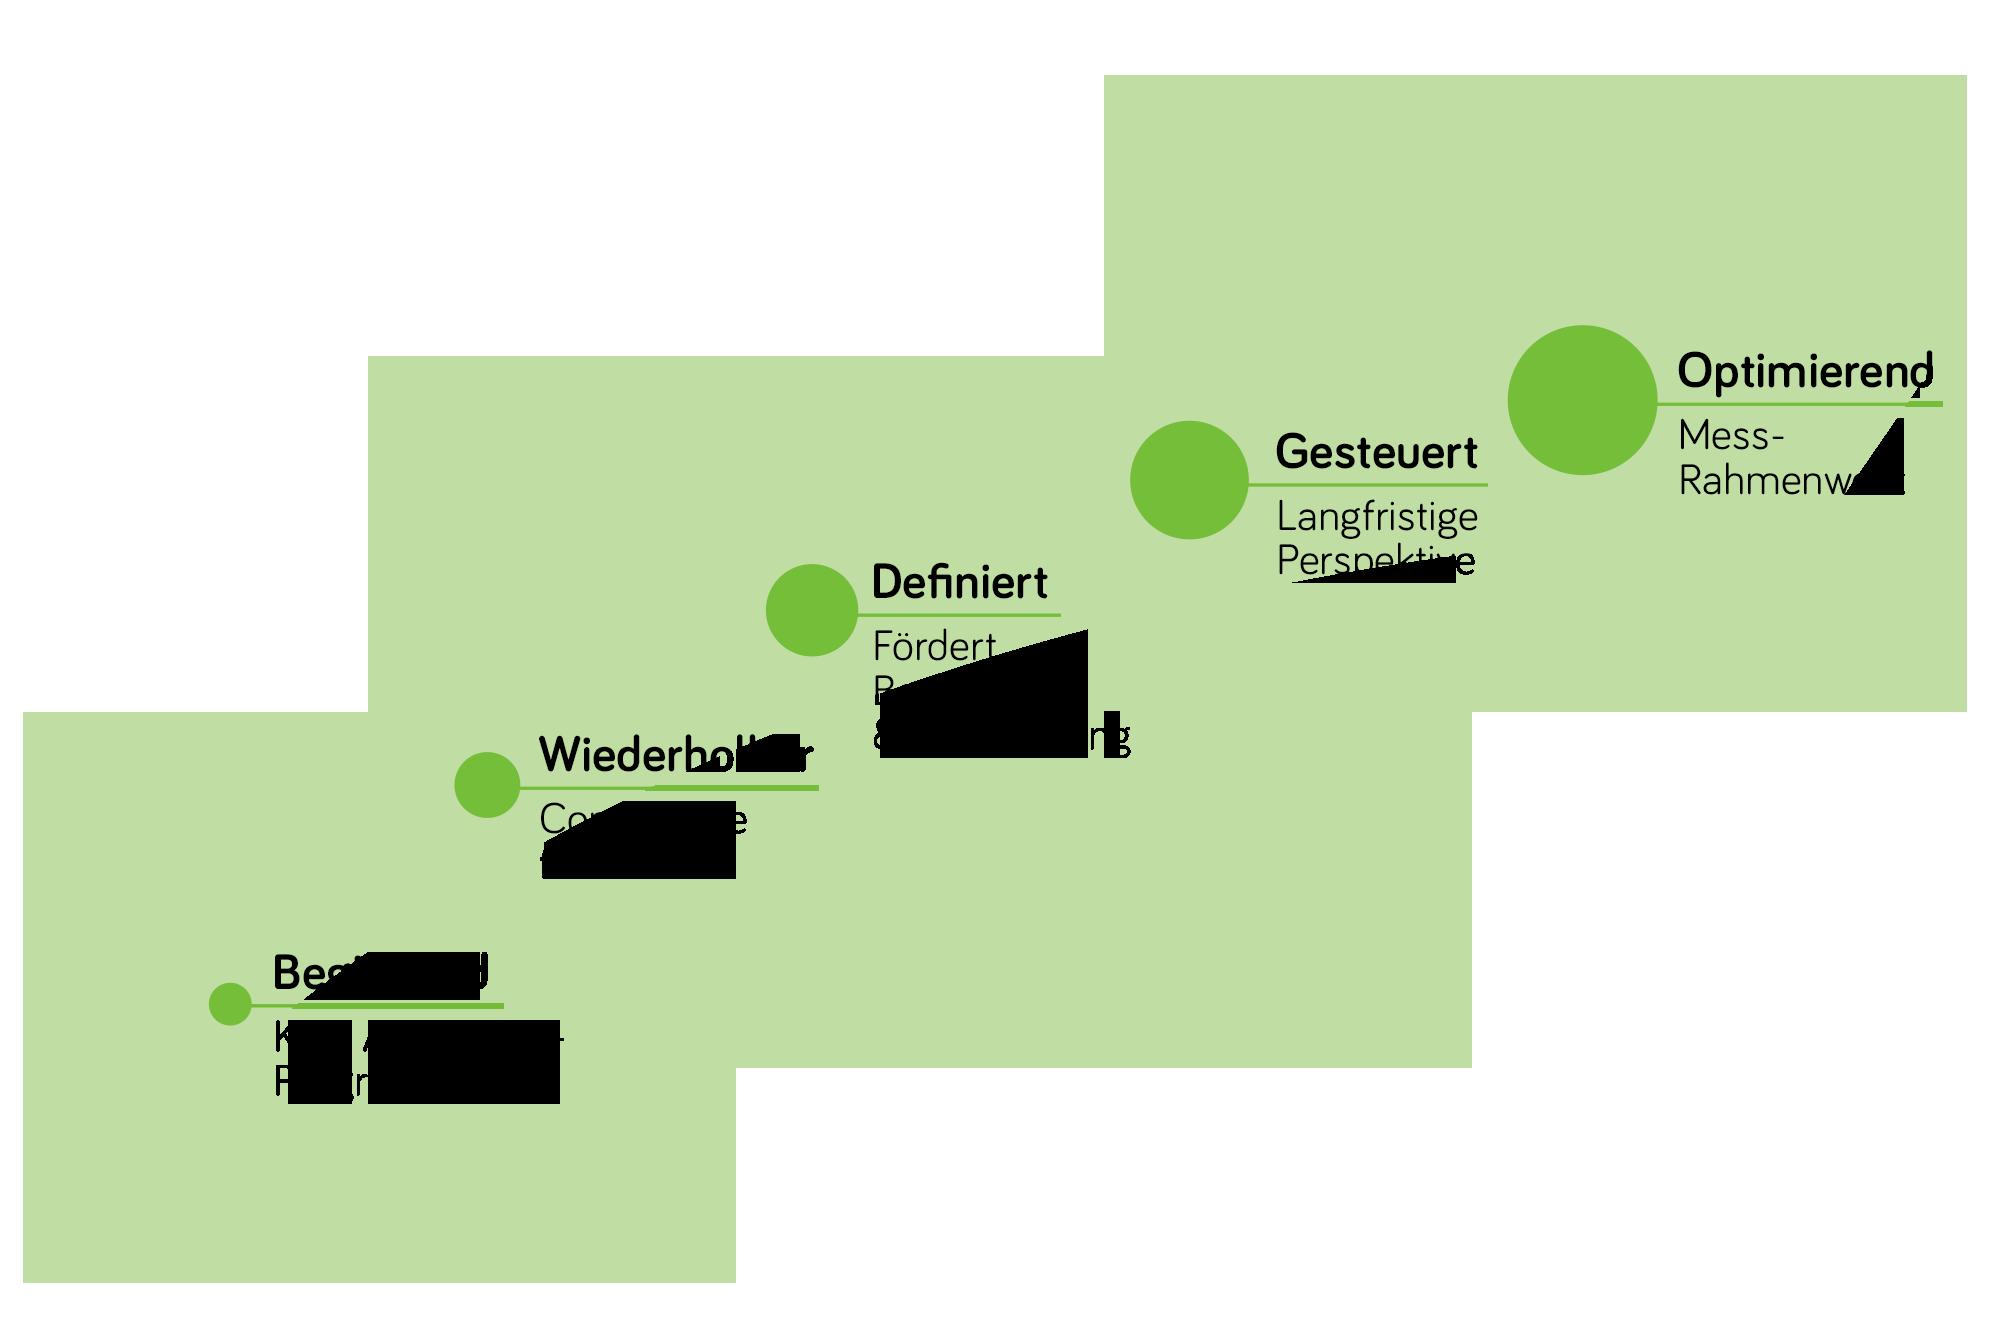 Reifegradmodell (CMM - Capability Maturity Model) der Sicherheitskultur